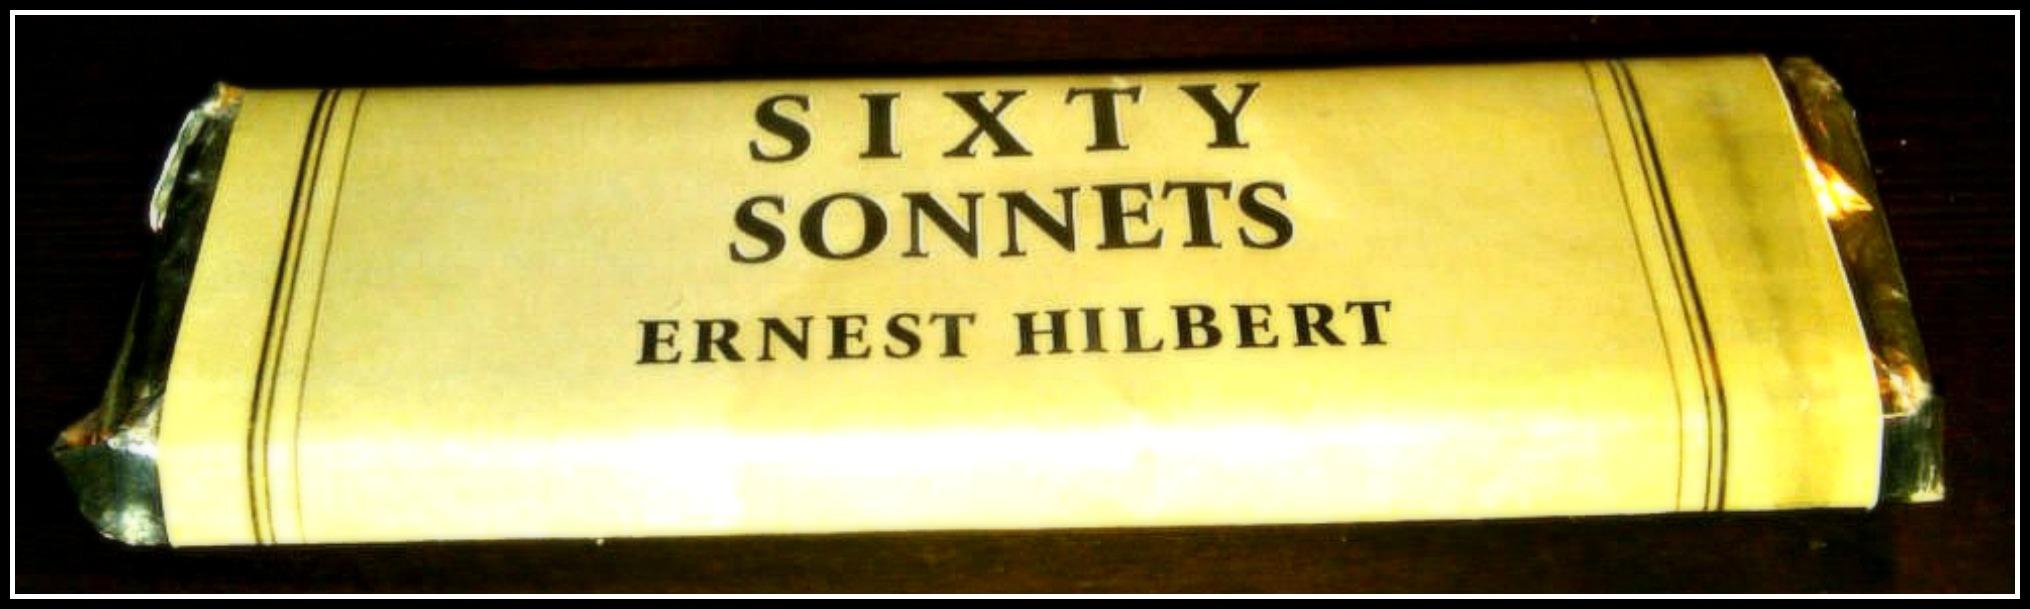 Ernest Hilbert's Books - E-Verse RadioE-Verse Radio